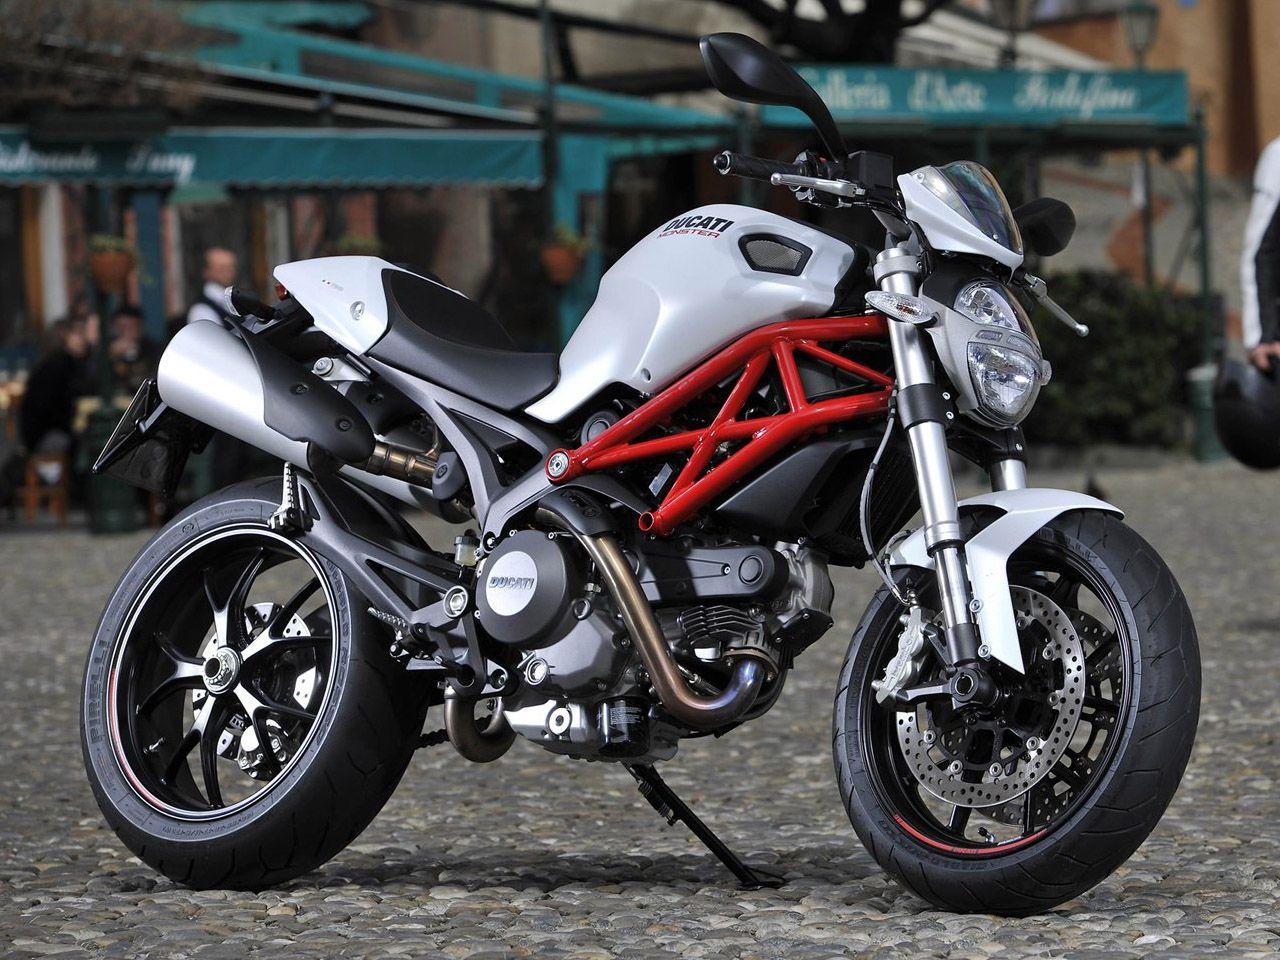 2011 Ducati Monster 796 Comparison Review